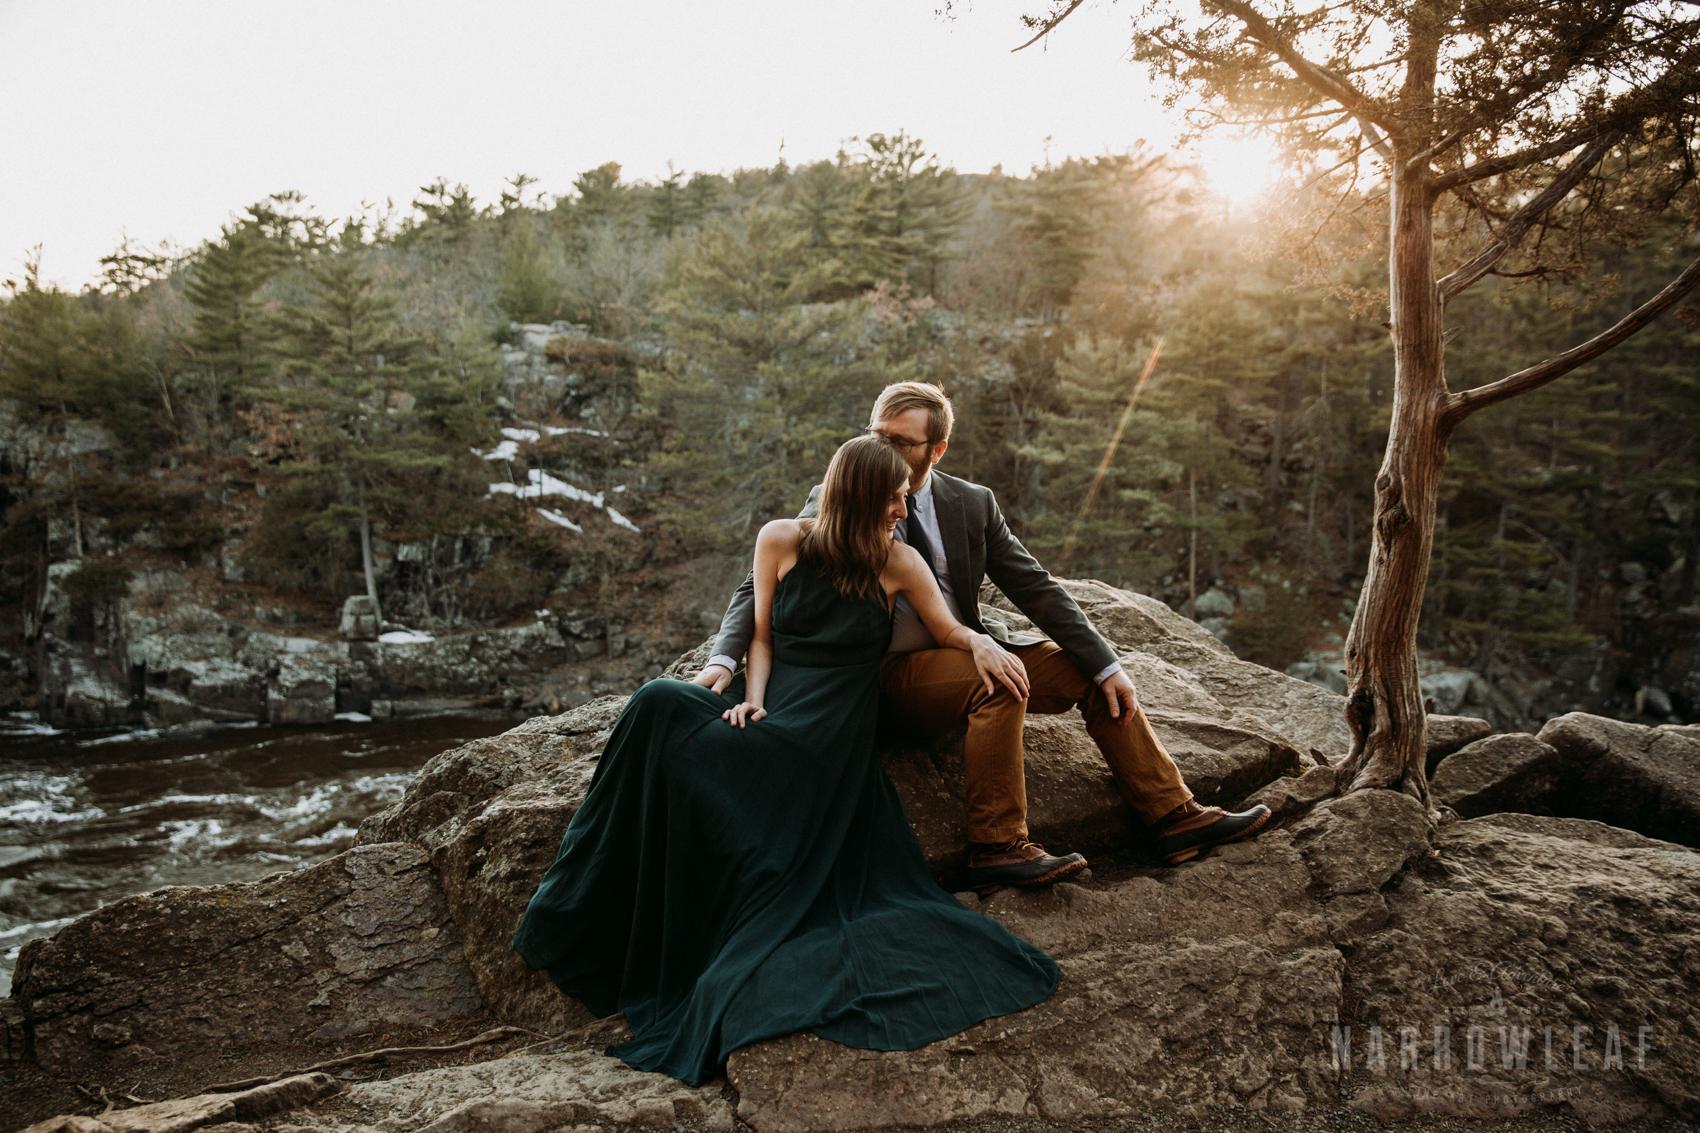 Spring-moody-wisconsin-woodsy-elopement-NarrowLeaf_Love_&_Adventure_Photography-9026.jpg